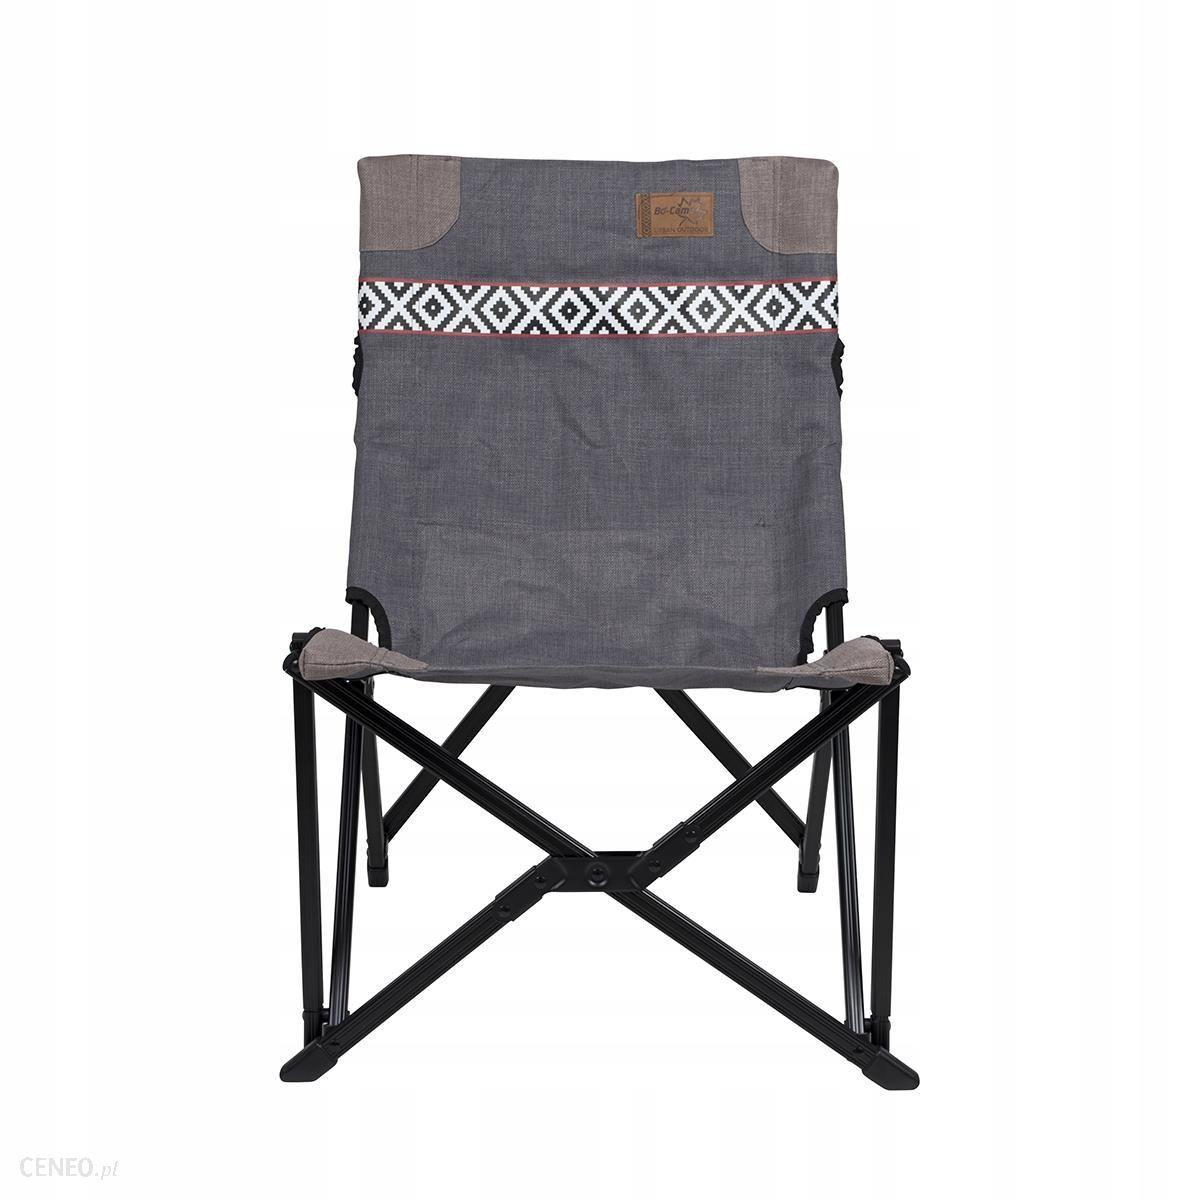 Krzesło kempingowe Brooklyn - Szary